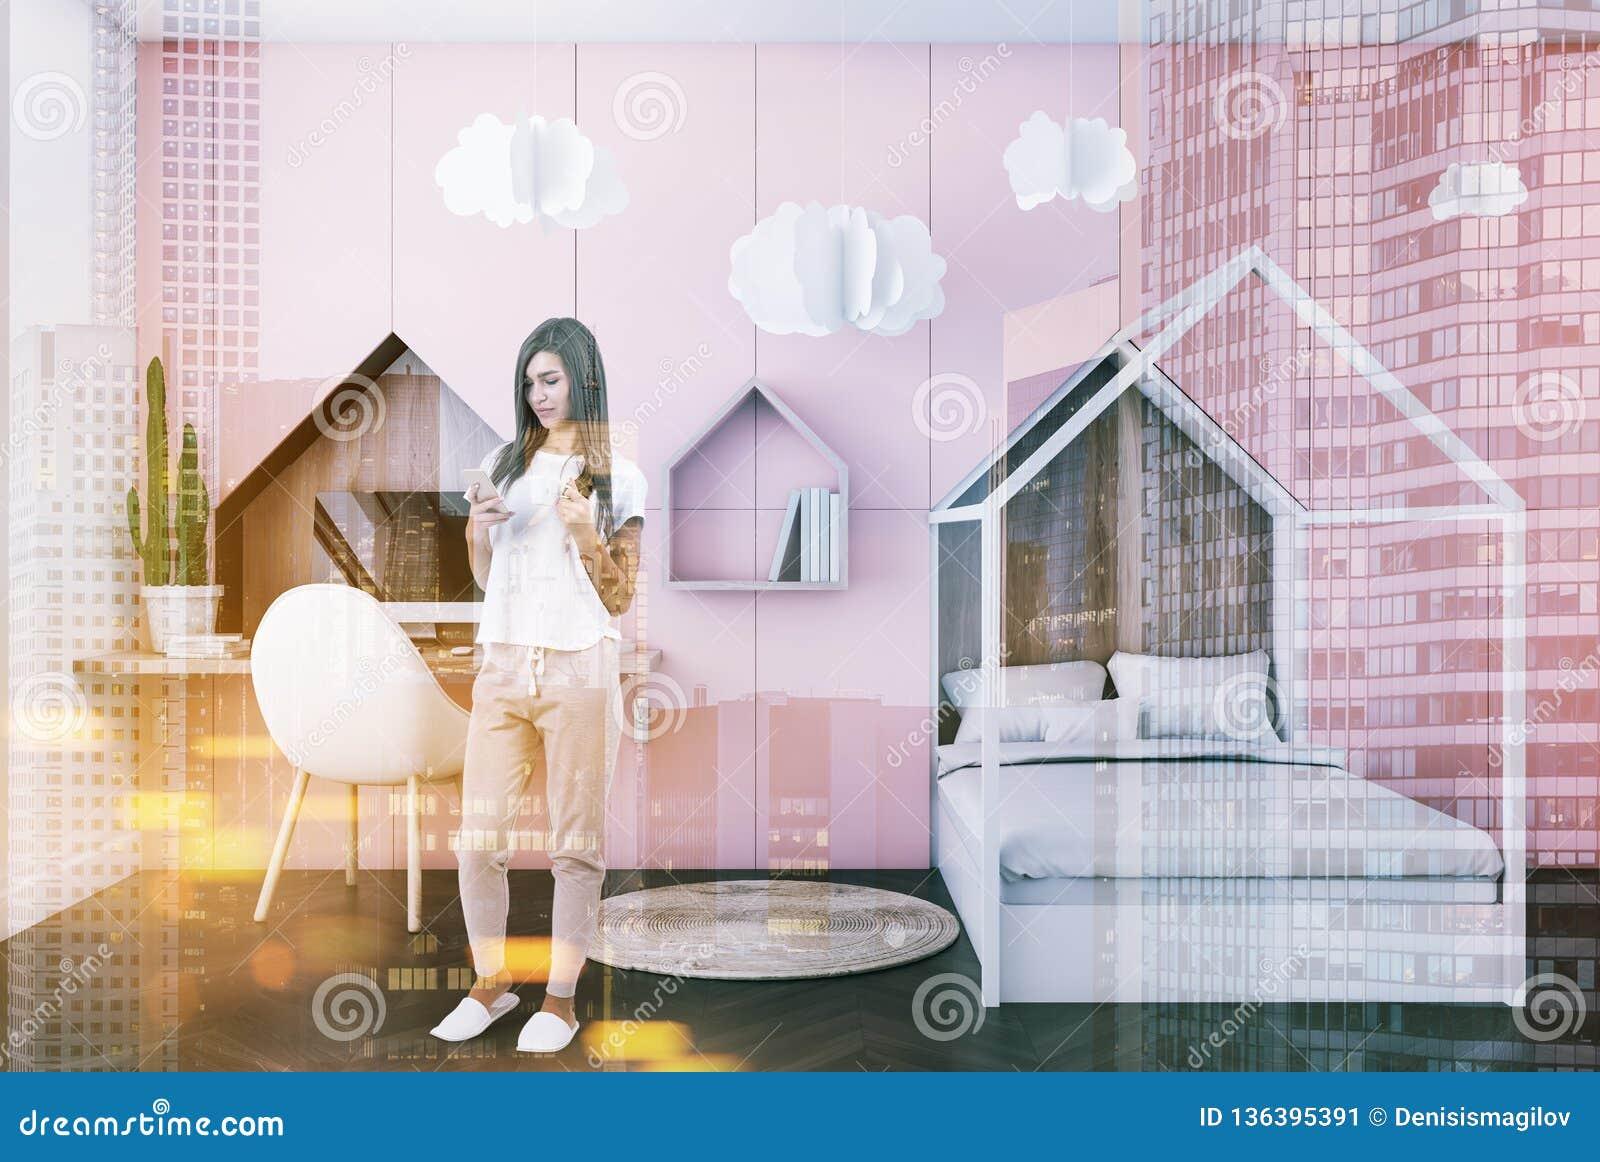 Pink Kids Bedroom Interior, Woman Stock Image - Image of ...